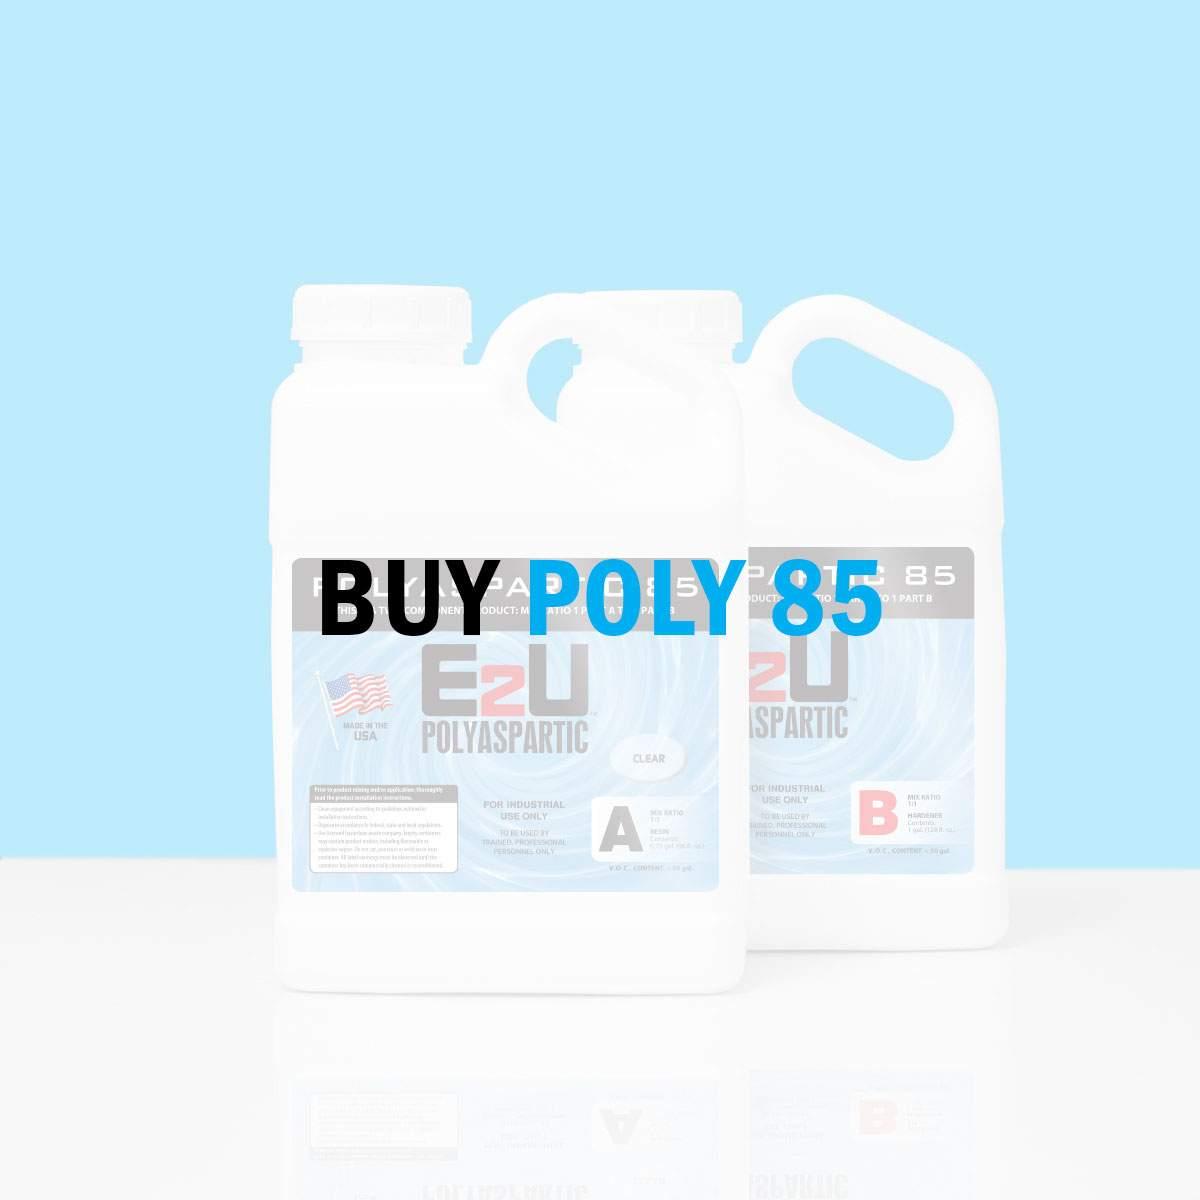 Buy-Poly-85